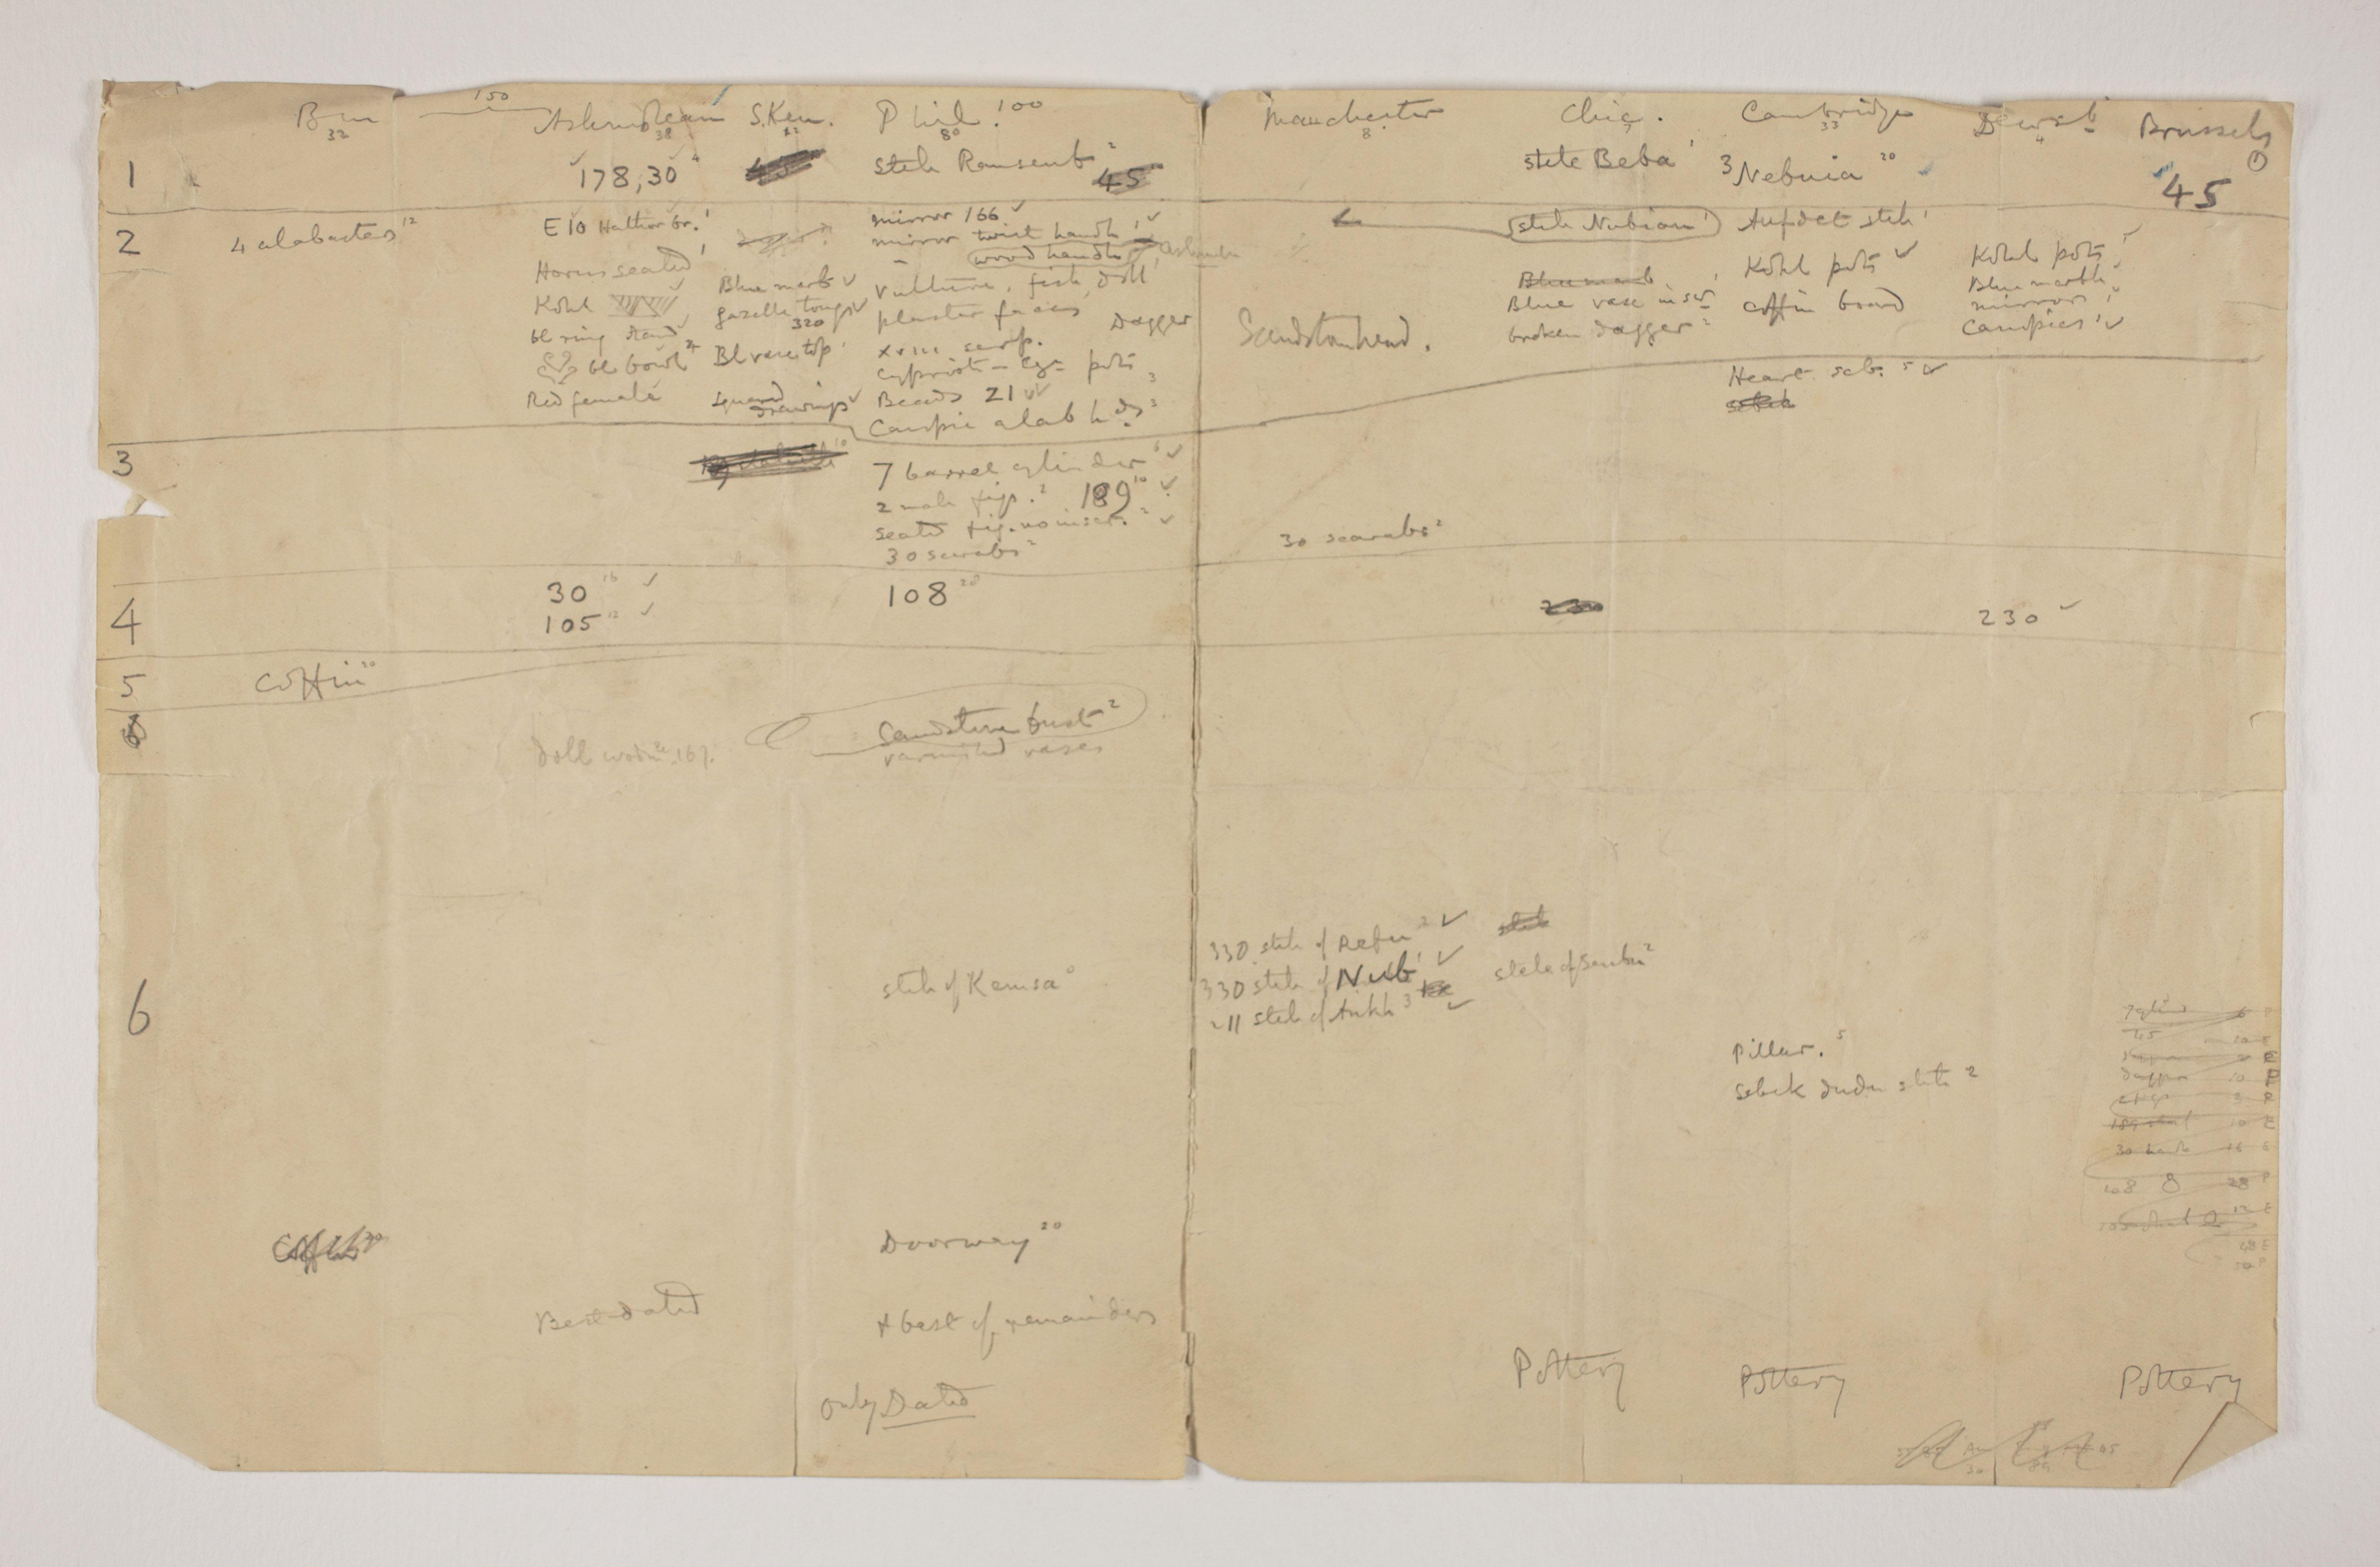 1899-1900 Abydos Multiple institution list PMA/WFP1/D/8/1.2